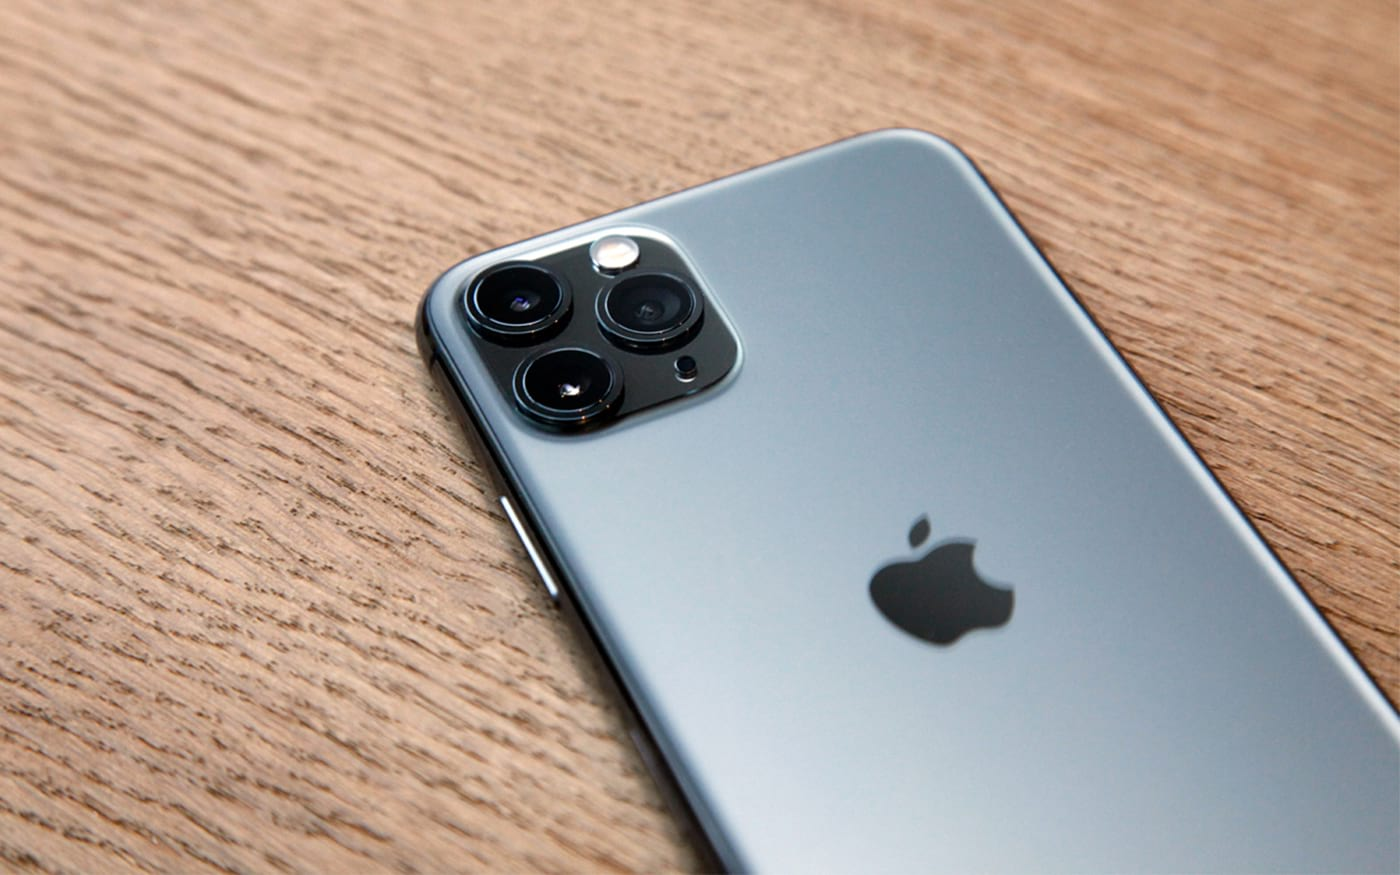 Apple Se Recusa A Arrumar Iphones Vendidos Como Resistentes A Agua E Procon Sp Notifica Empresa Jovem Pan